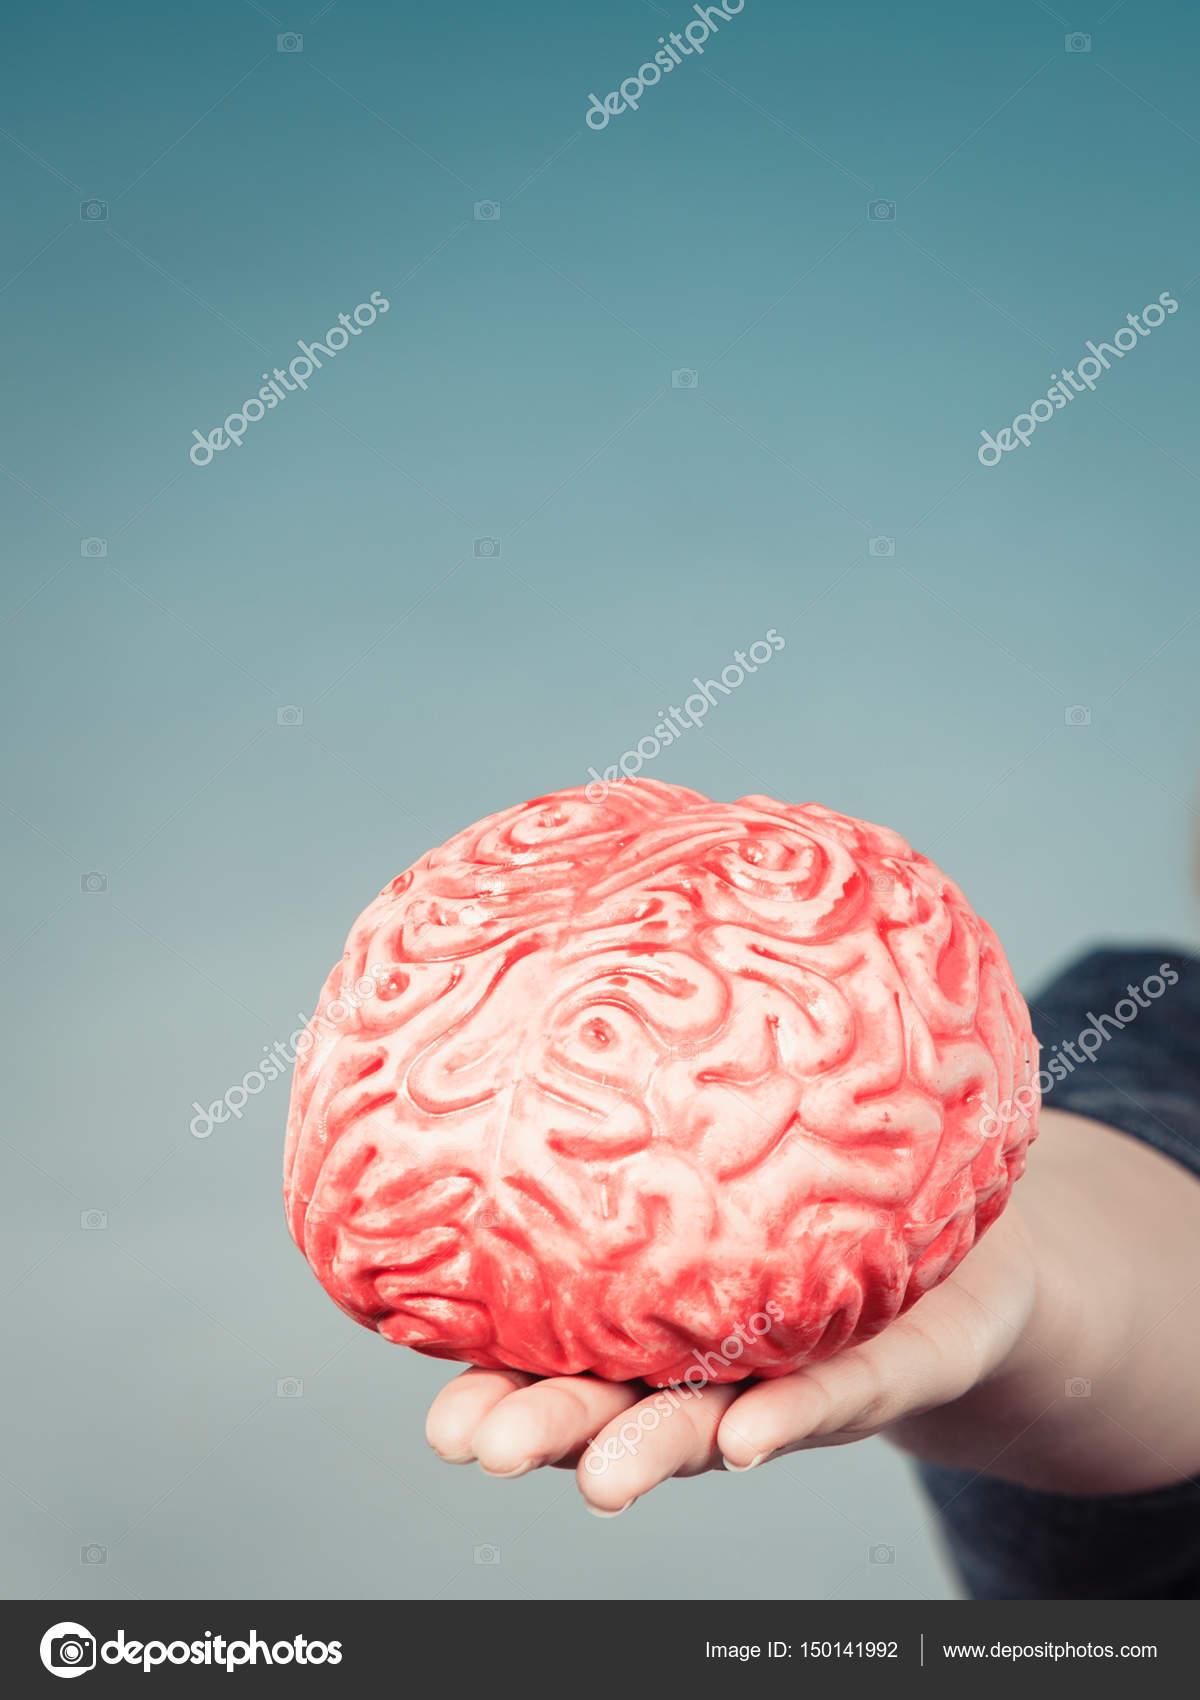 Frau Hand Holding Gehirn — Stockfoto © Voyagerix #150141992